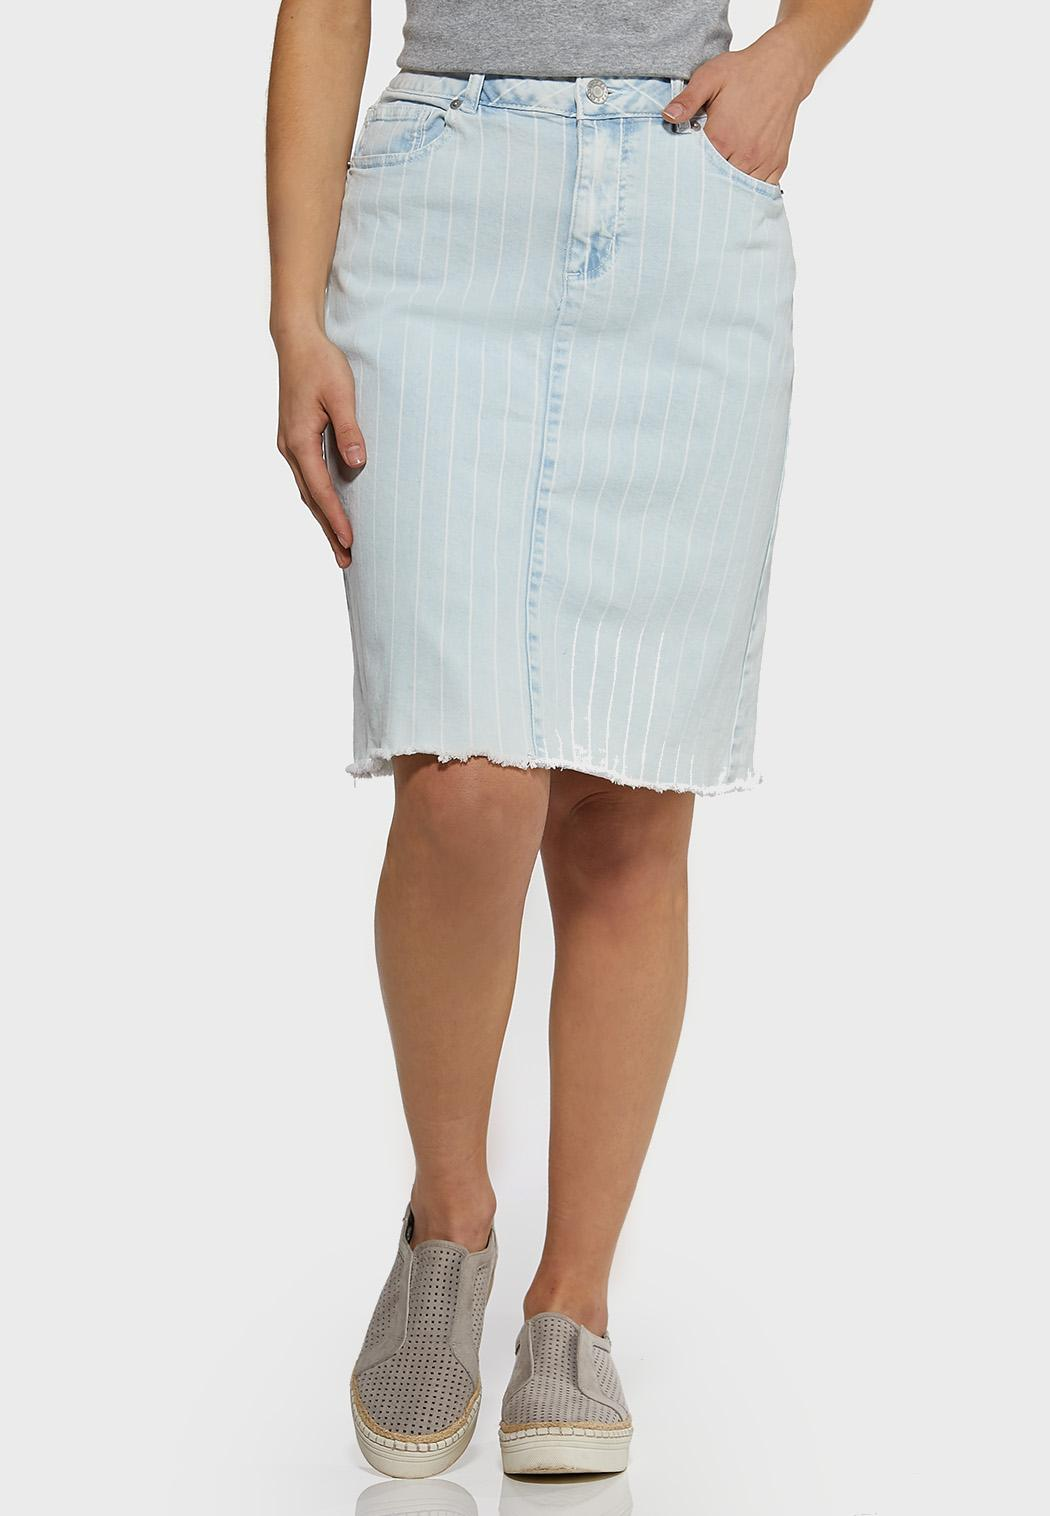 Striped Light Wash Denim Skirt